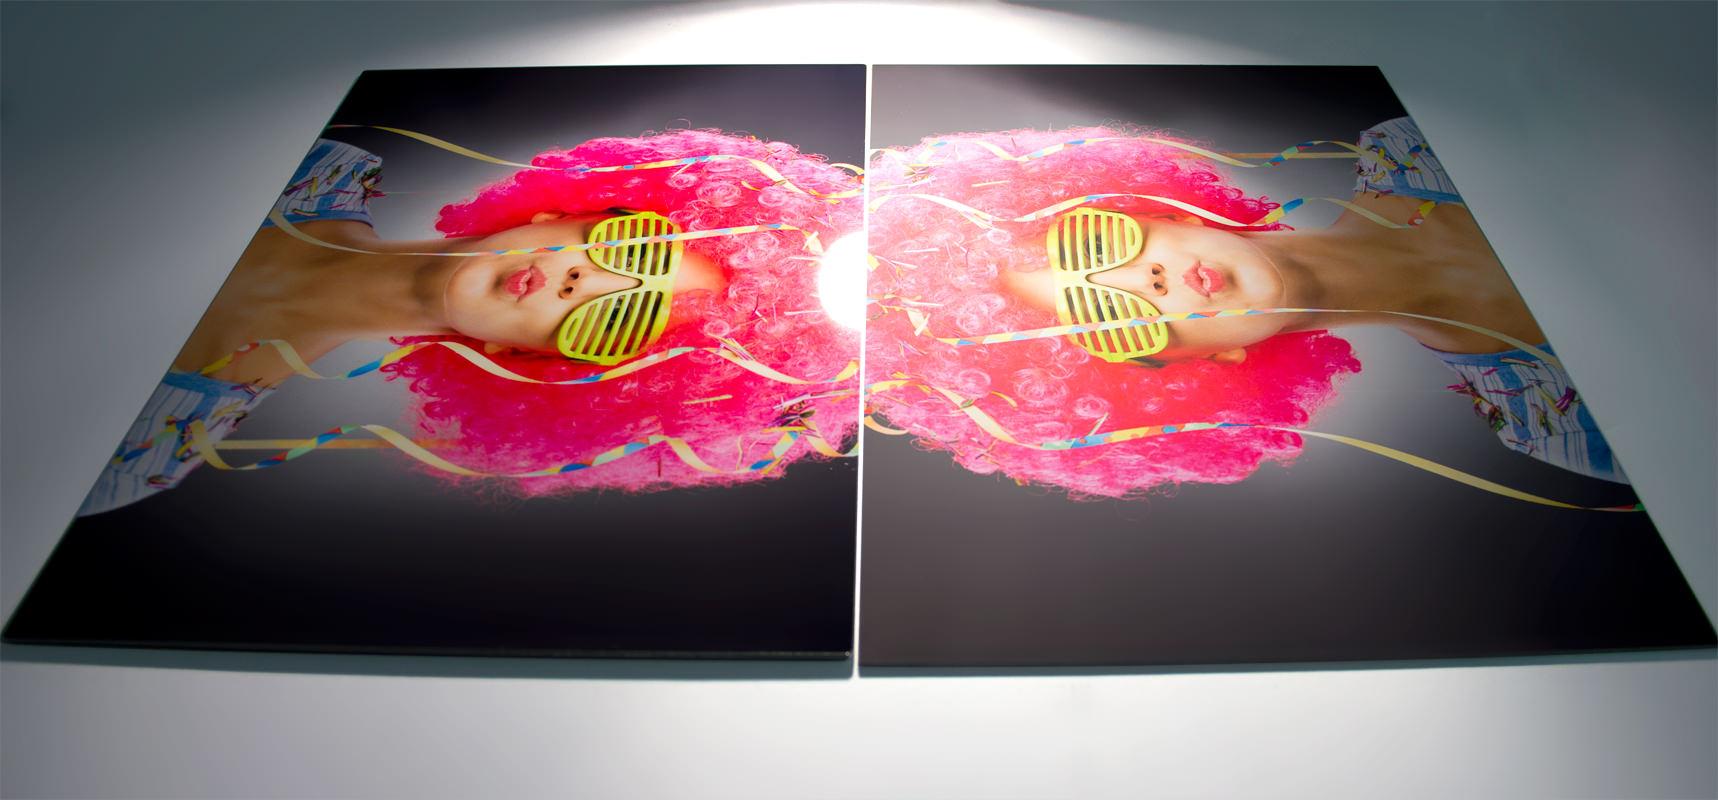 gloss laminate film example